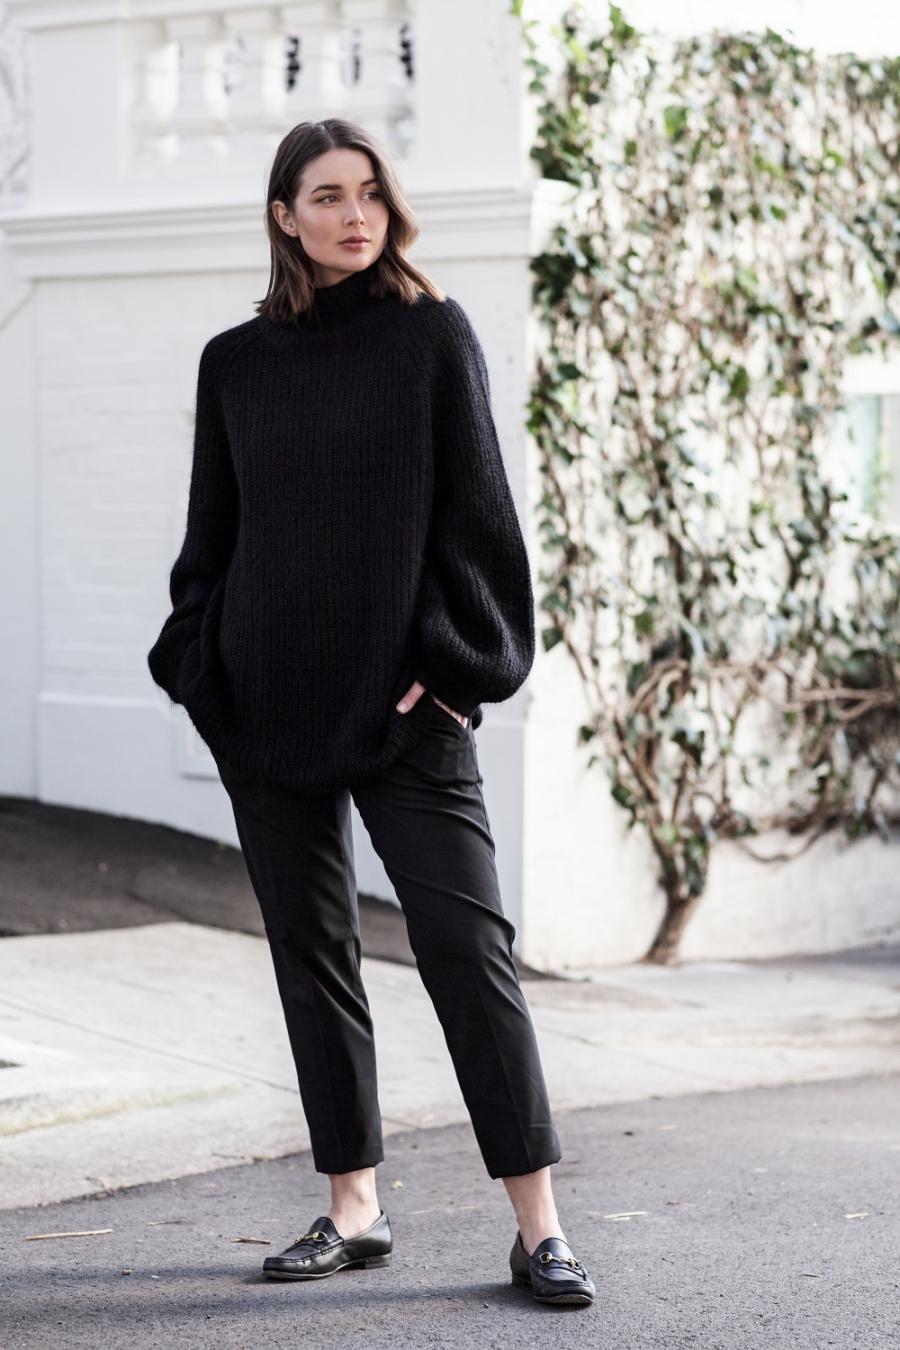 harperandharley_how-to-wear-oversized_black-jumper_outfit_streetstyle_1-mtjo687fzhhlqqa8fcuqlvbcs943euz1amraeyr8ho.jpg